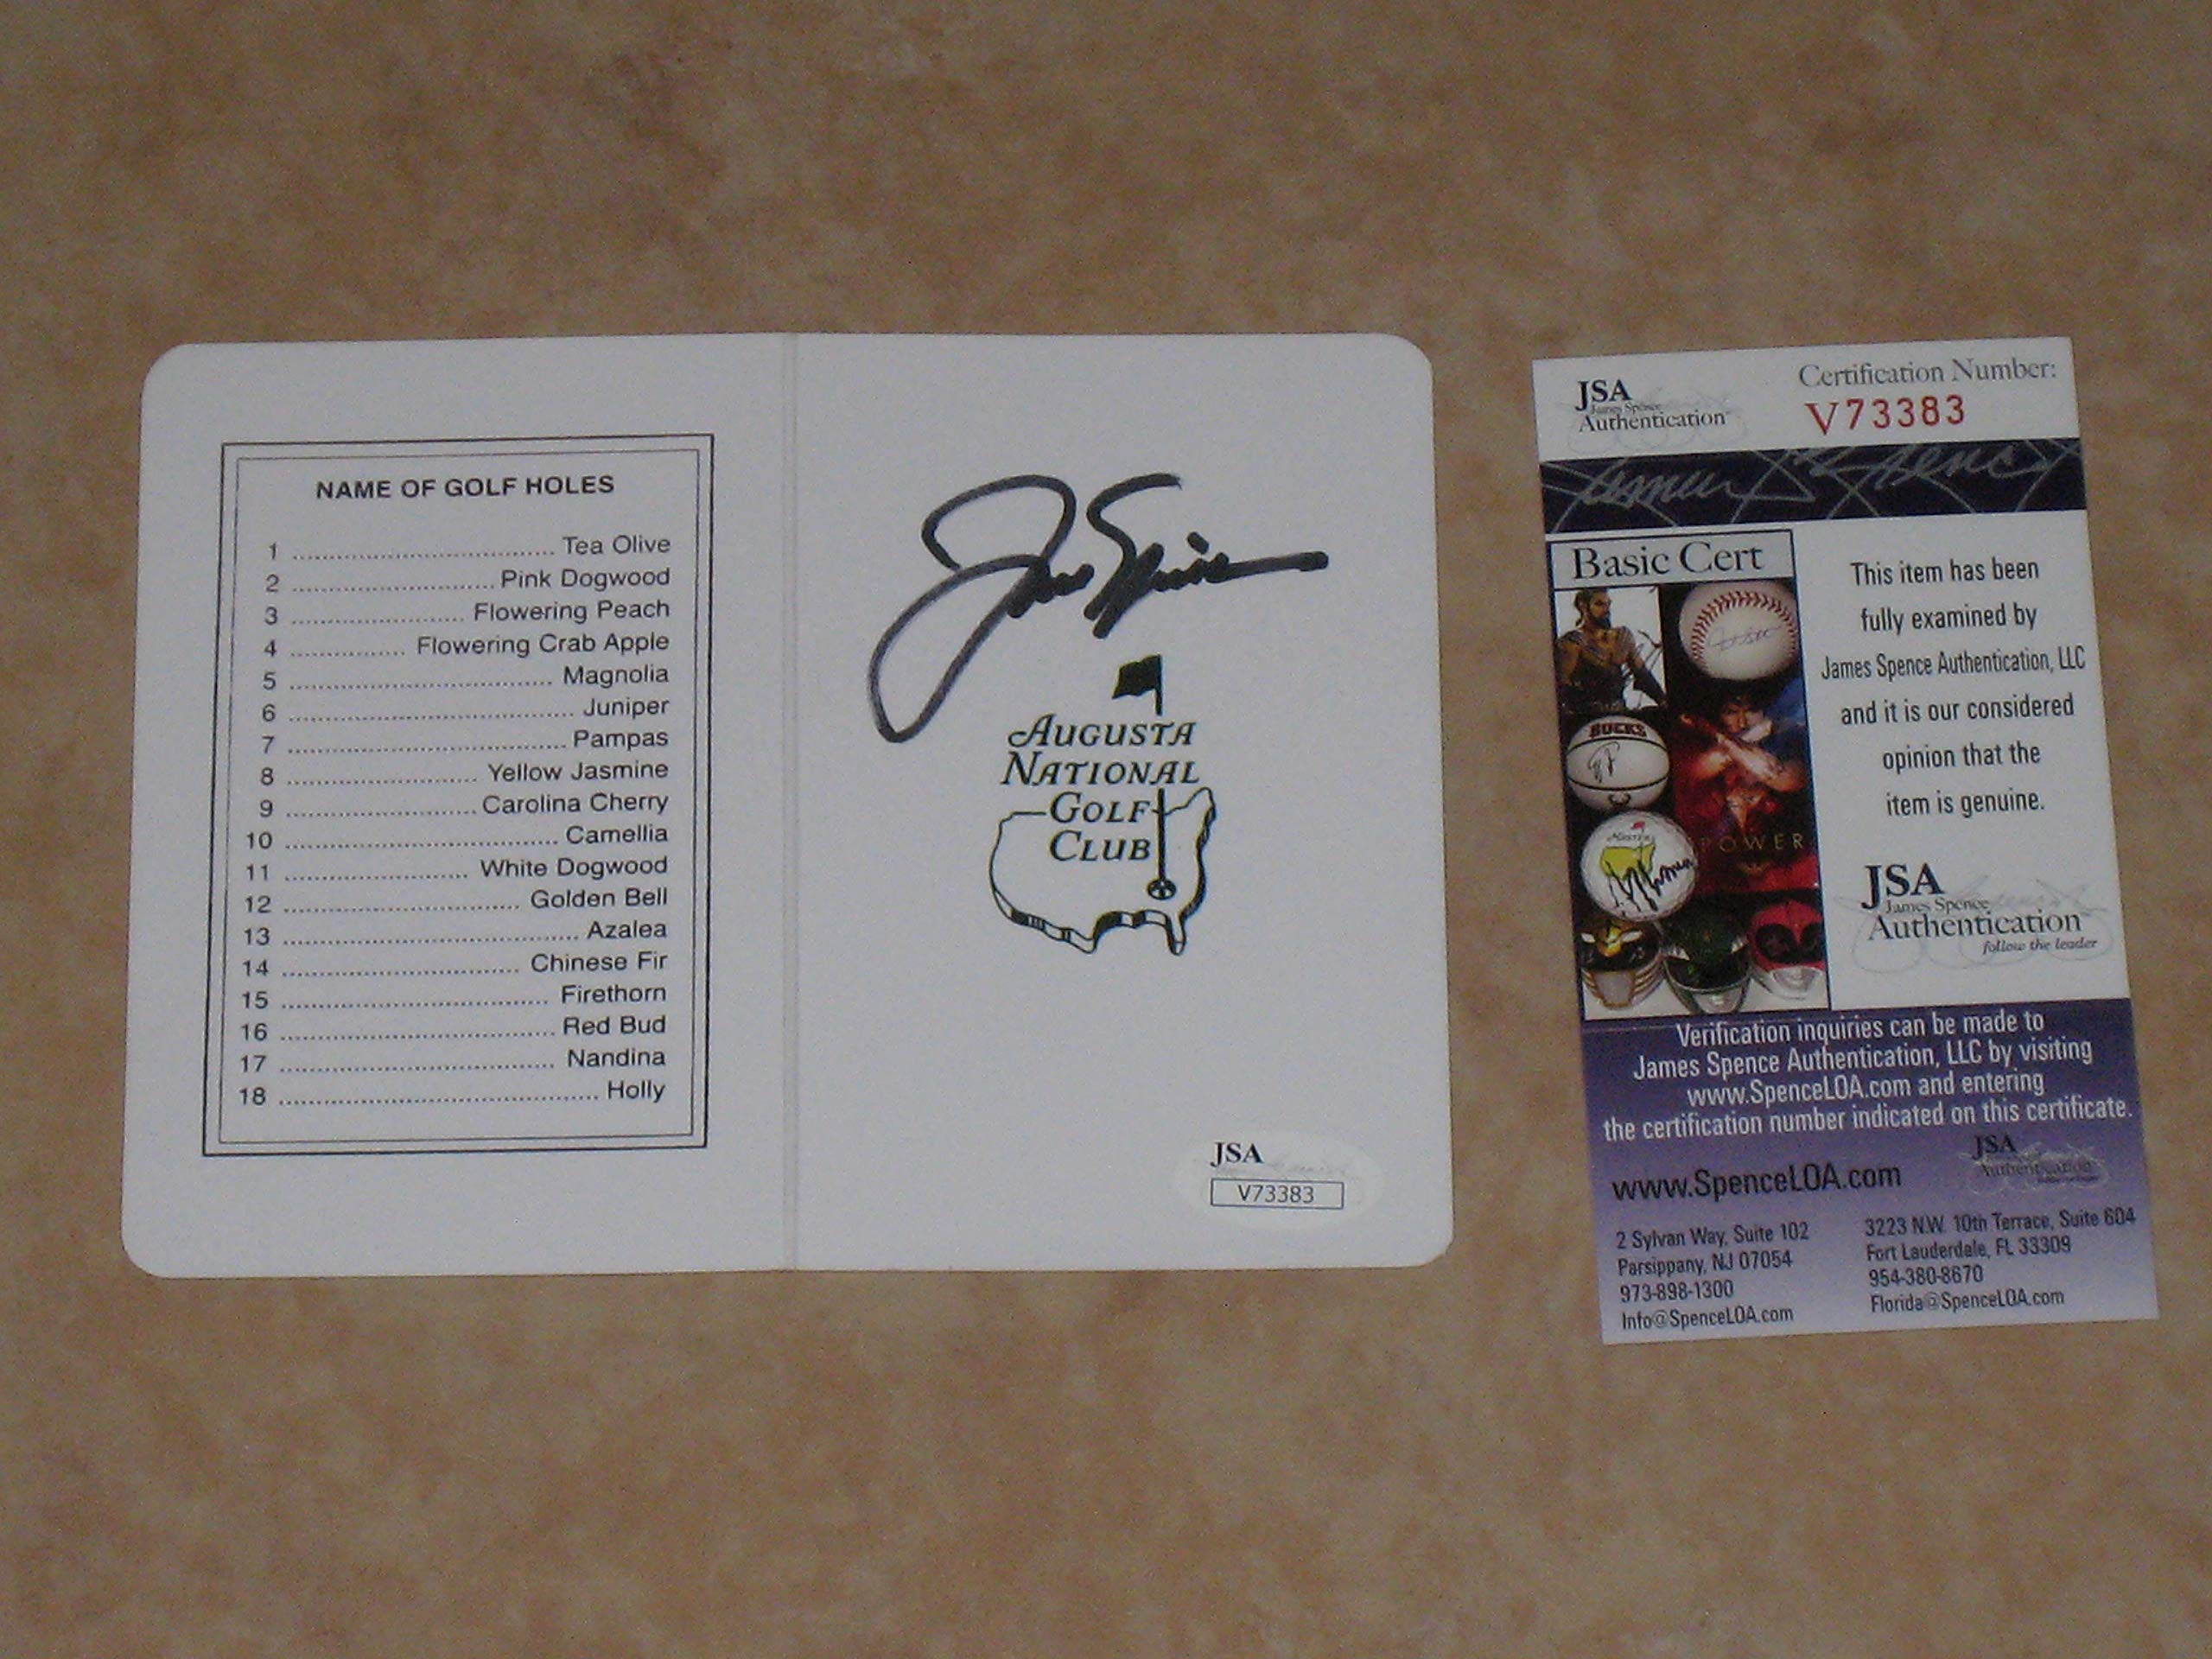 Jack Nicklaus PGA signed Autographed Masters Scorecard Augusta JSA COA